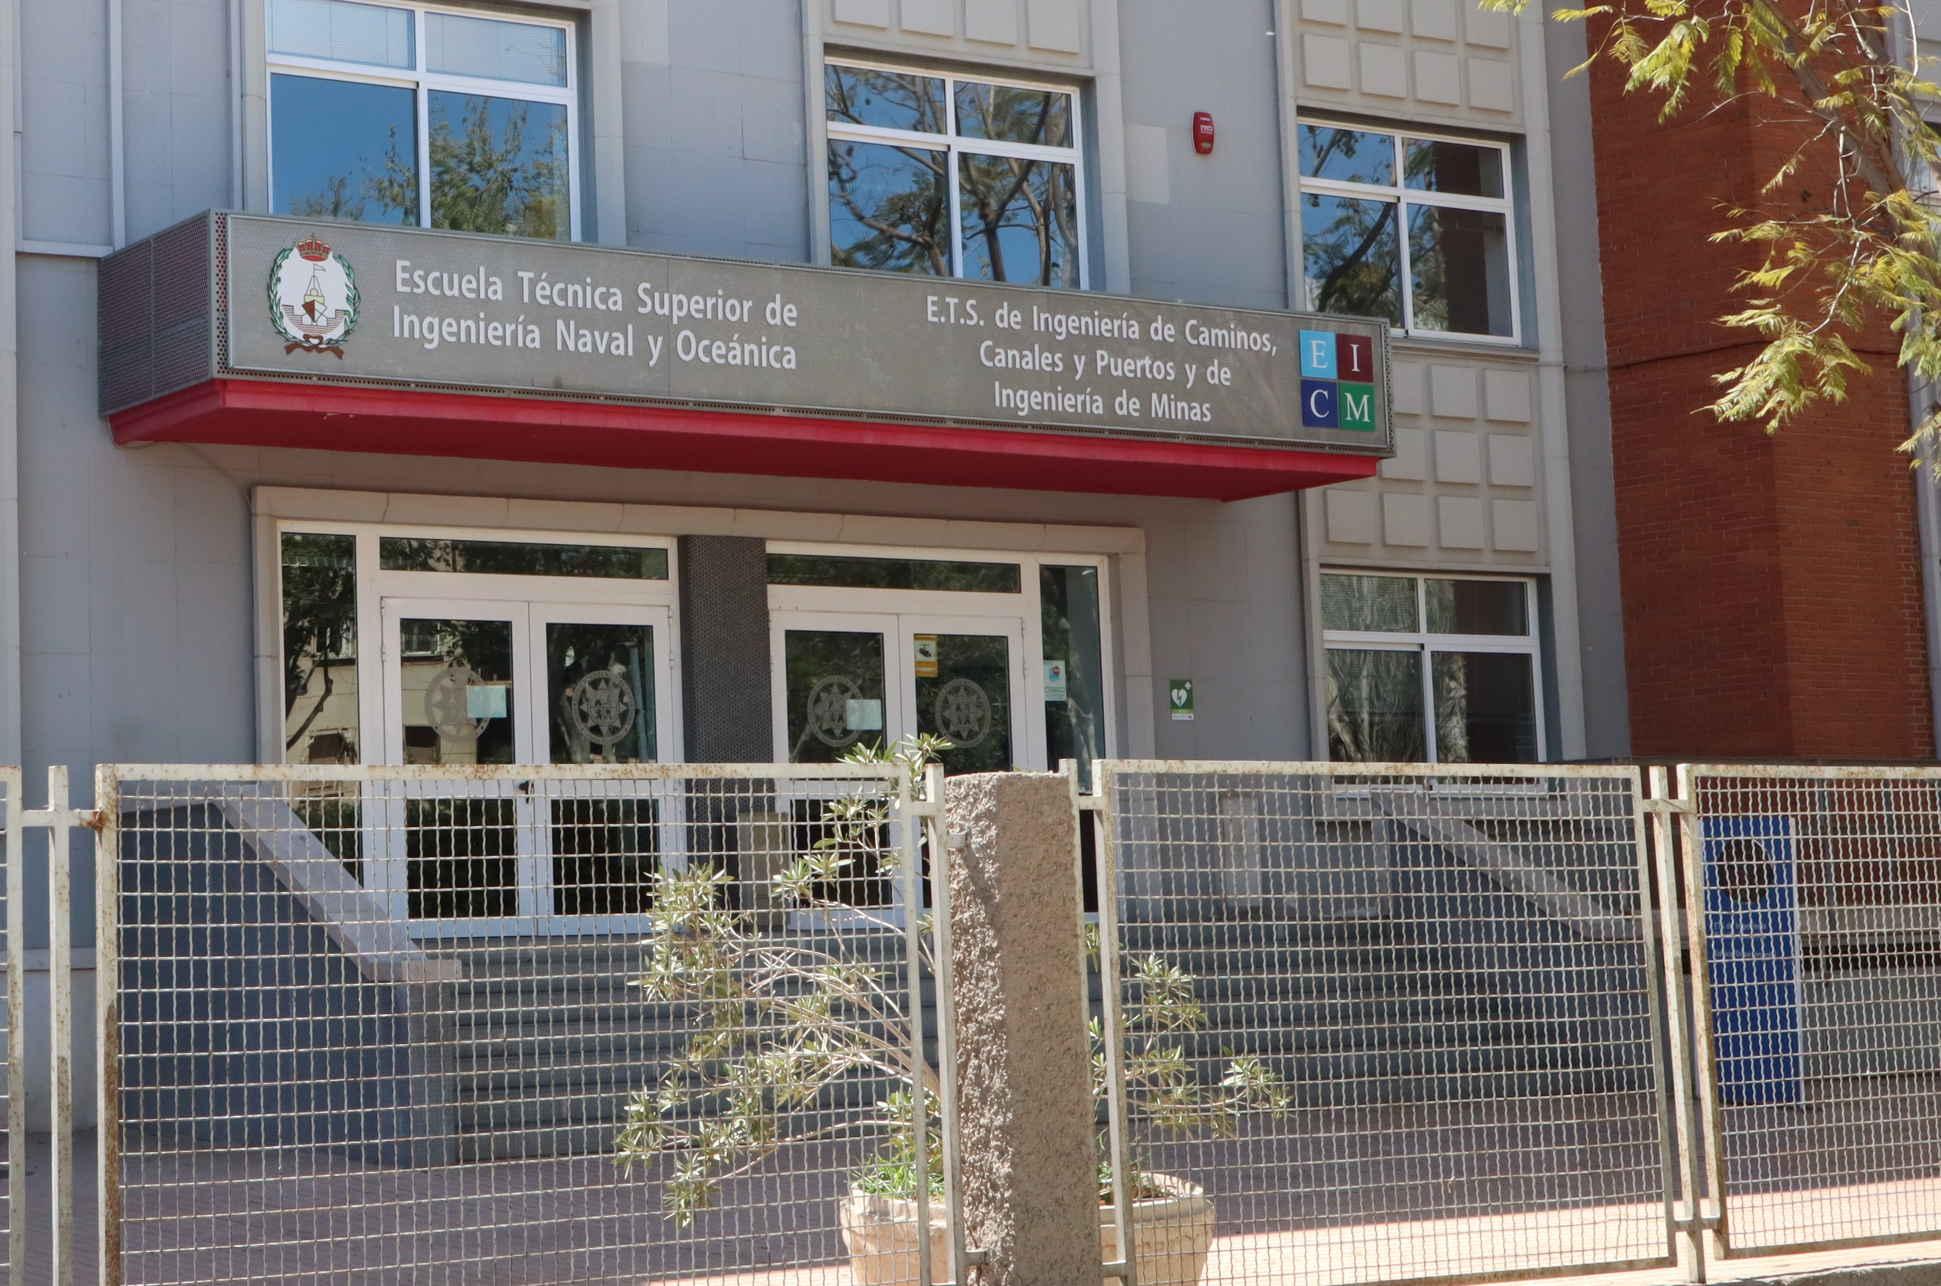 ELECCIONES A REPRESENTANTES DE ESTUDIANTES A JUNTA DE CENTRO DE EICM 2021